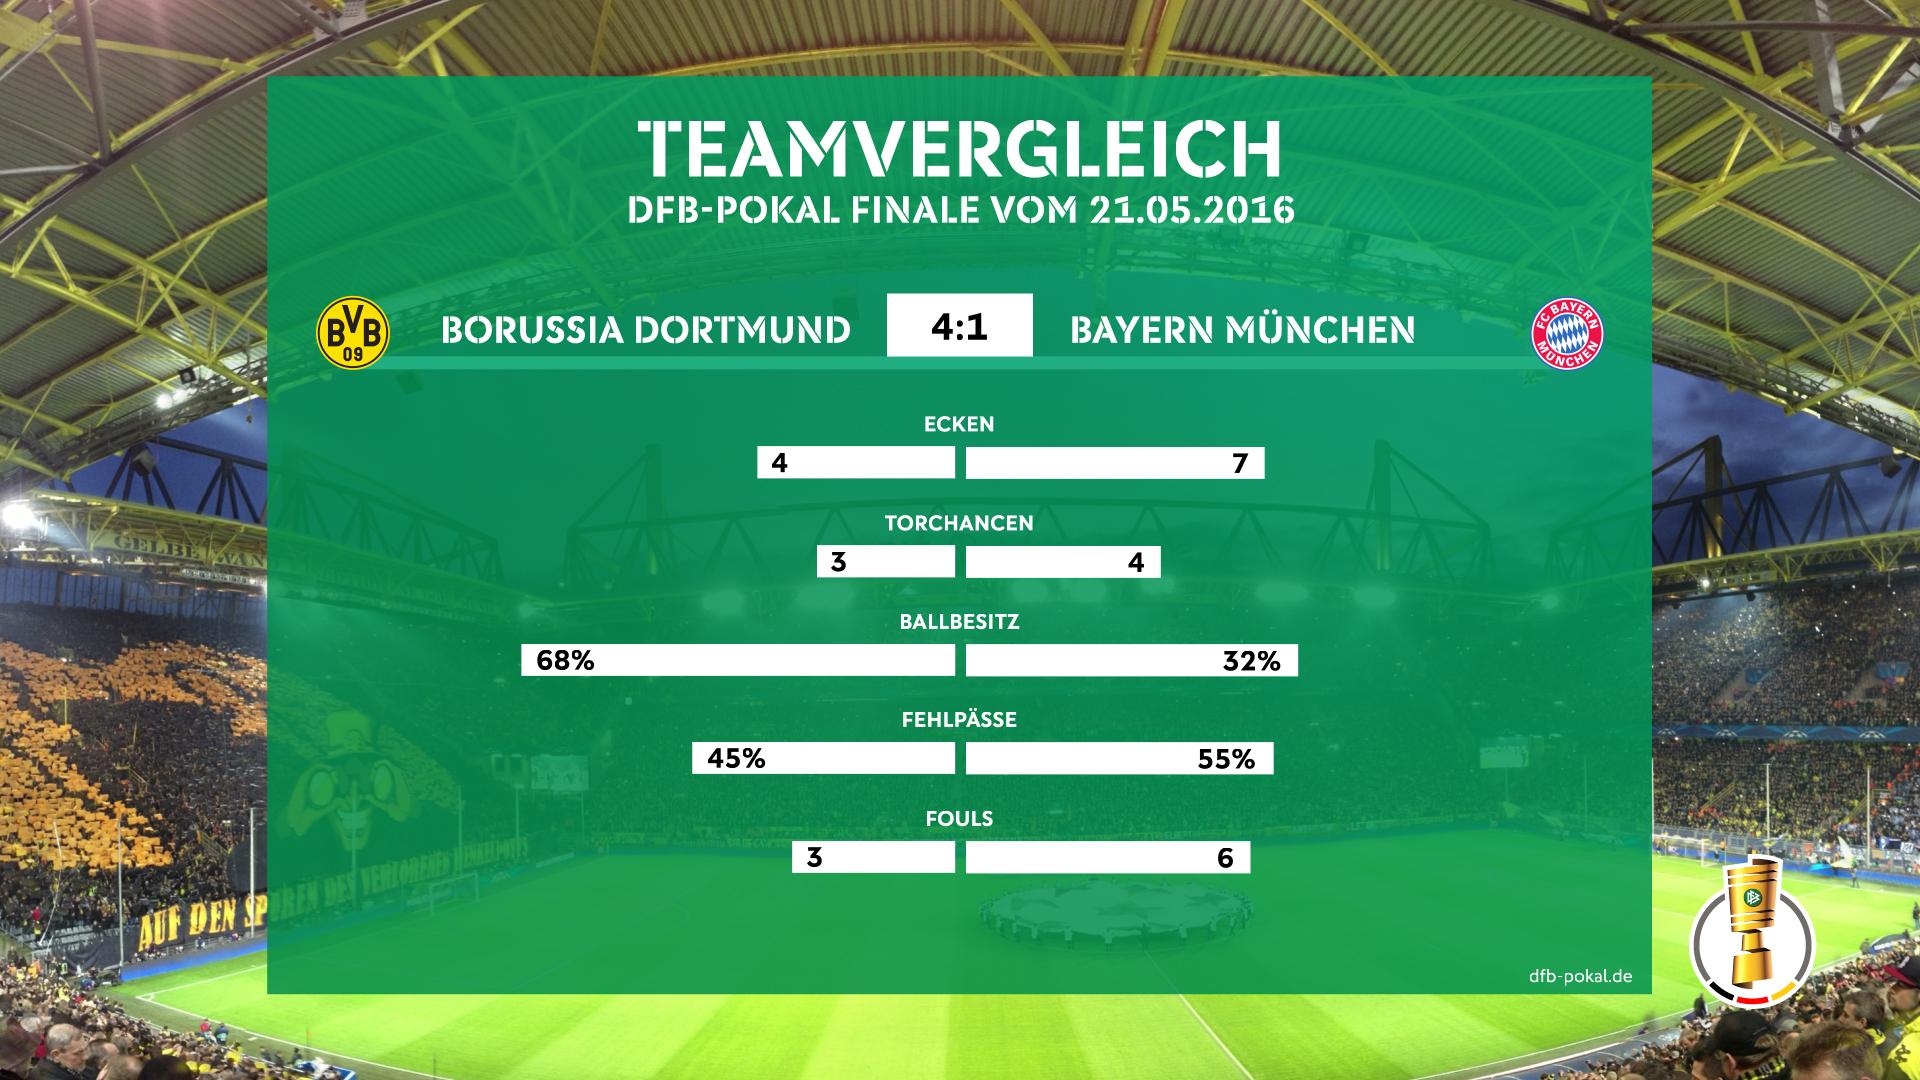 06_14_DFB-Pokal_VB_Vergleich-Statistik_Livebild